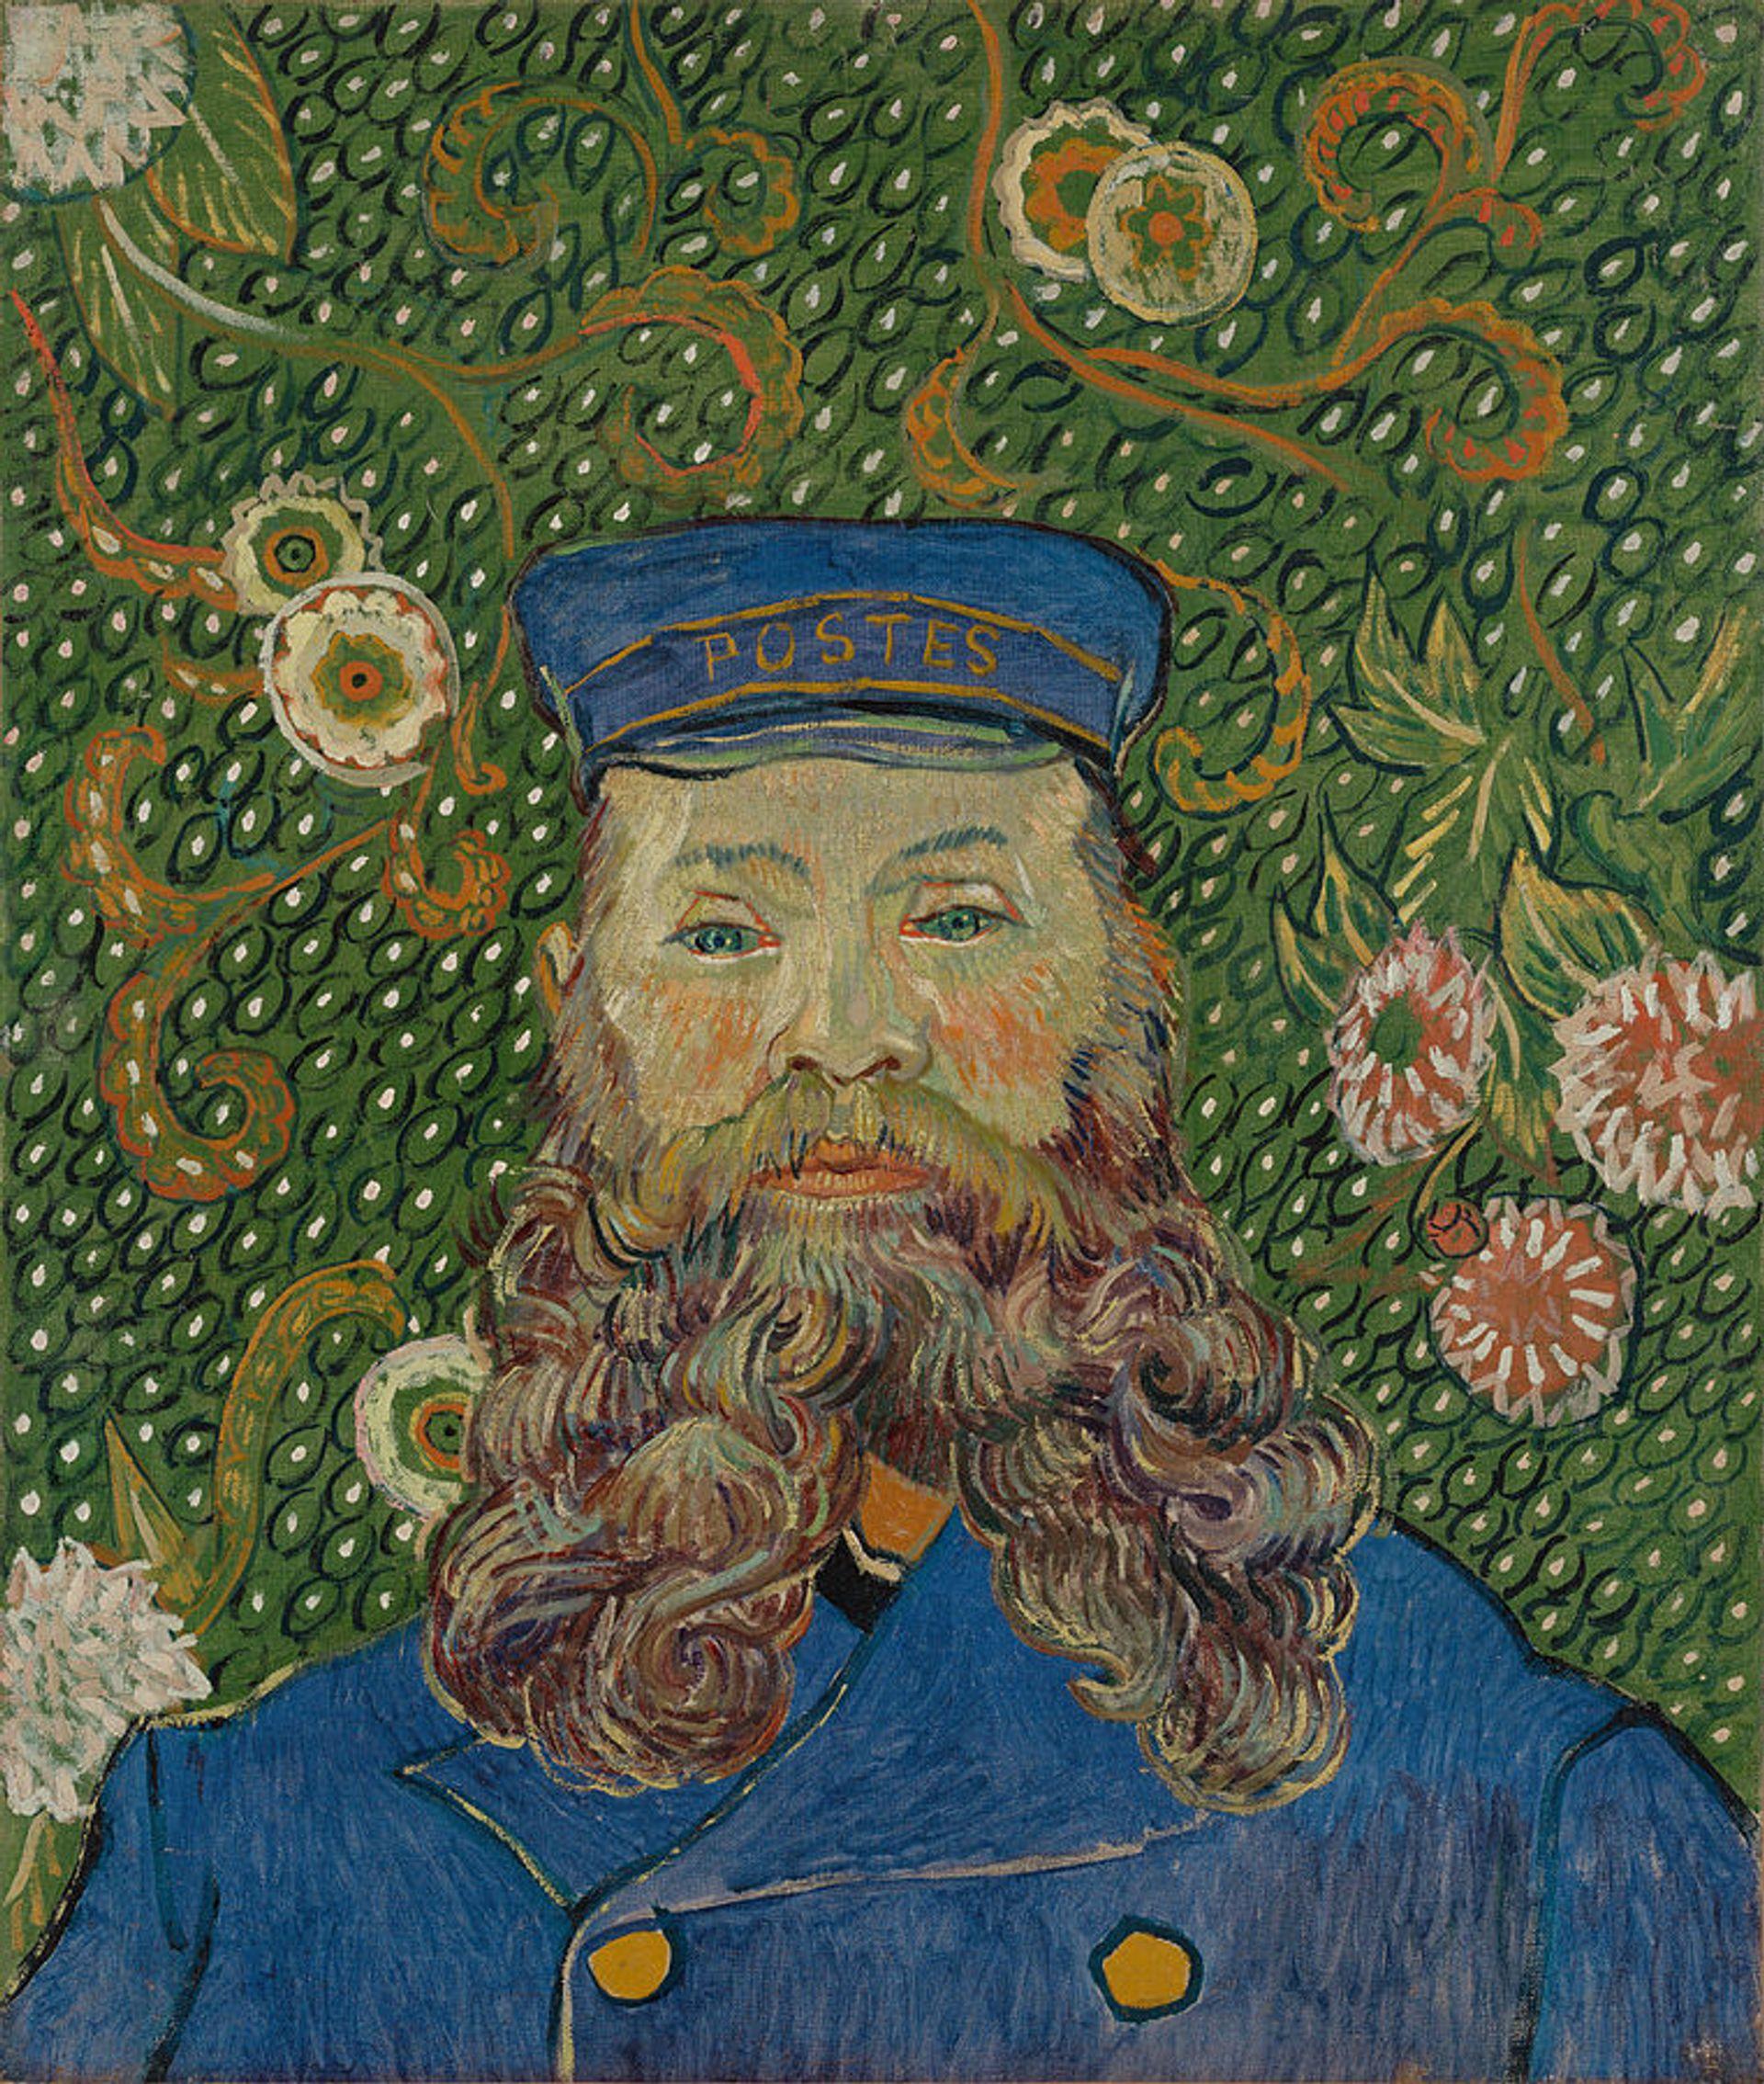 Vincent van Gogh's Portrait of Joseph Roulin (1889) © shooting brooklyn via Wikicommons